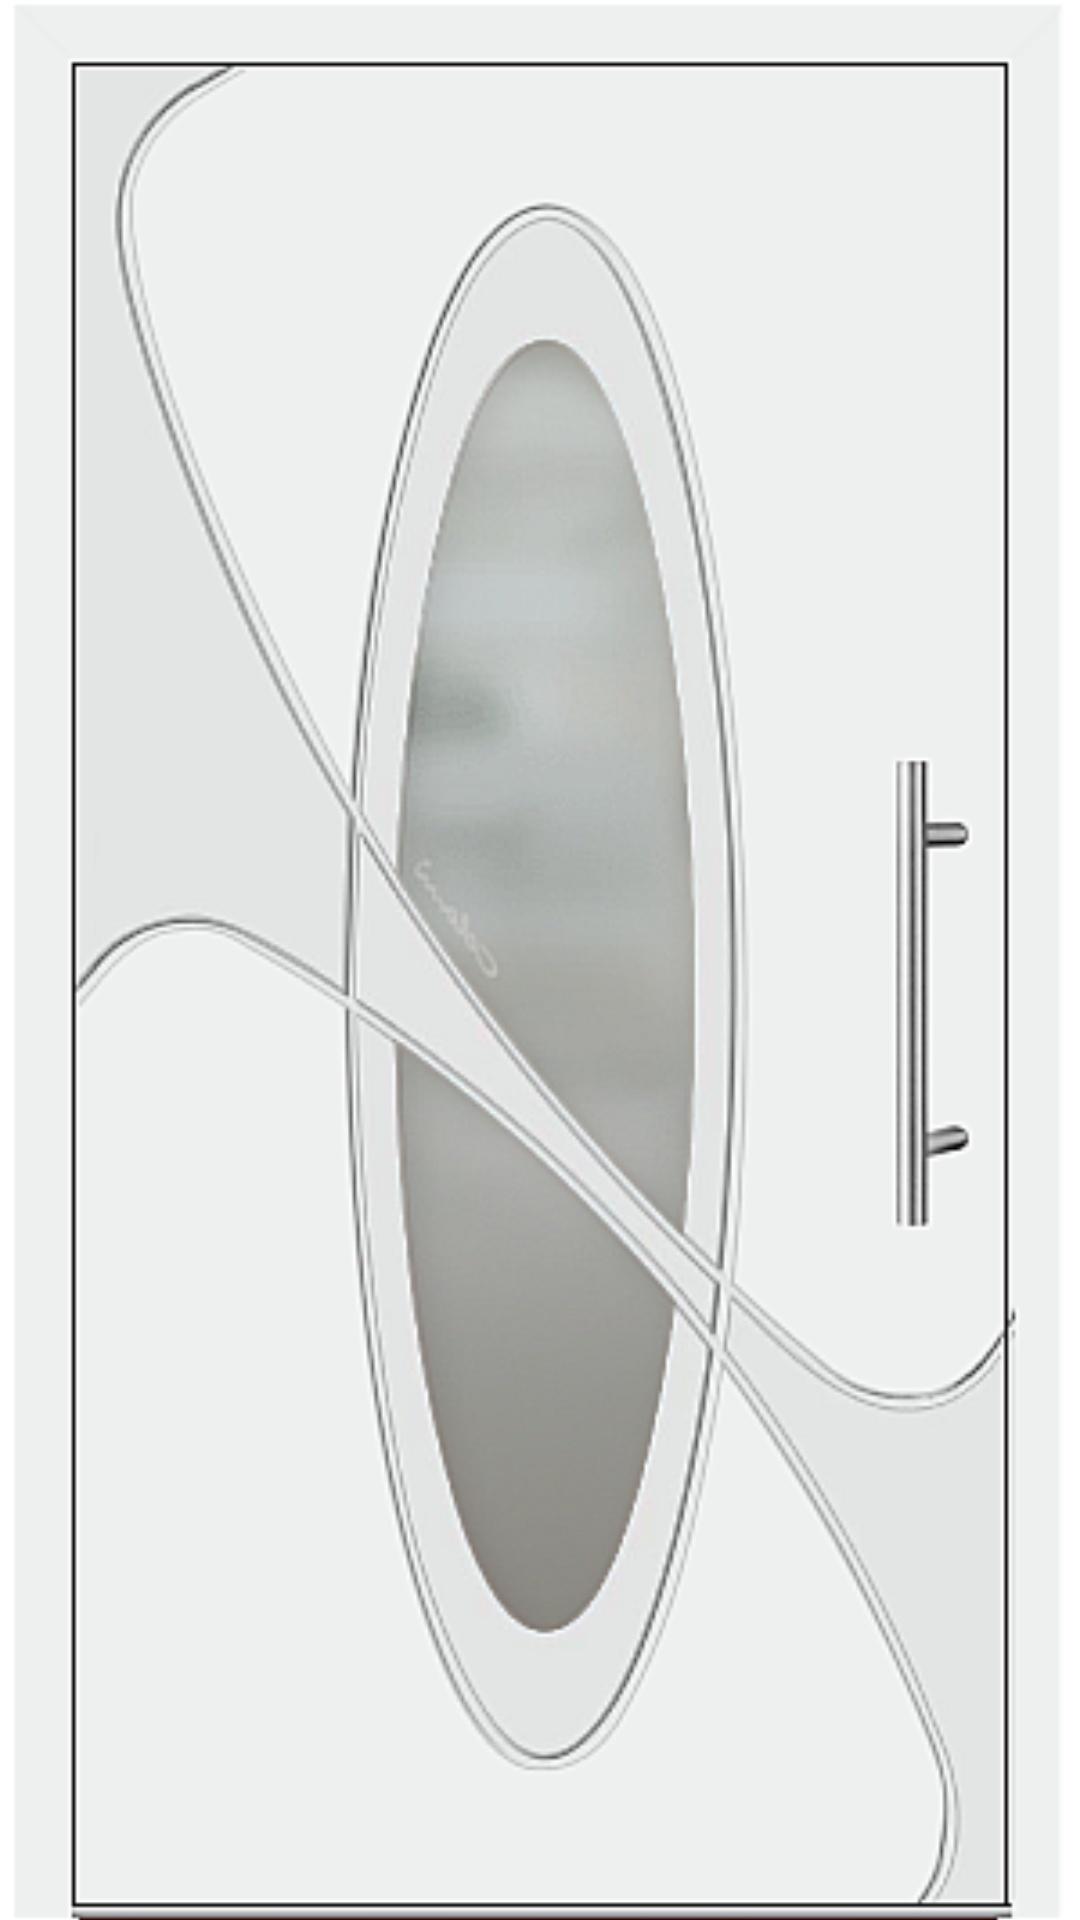 Aluminium Haustür Modell 6990-41 weiß